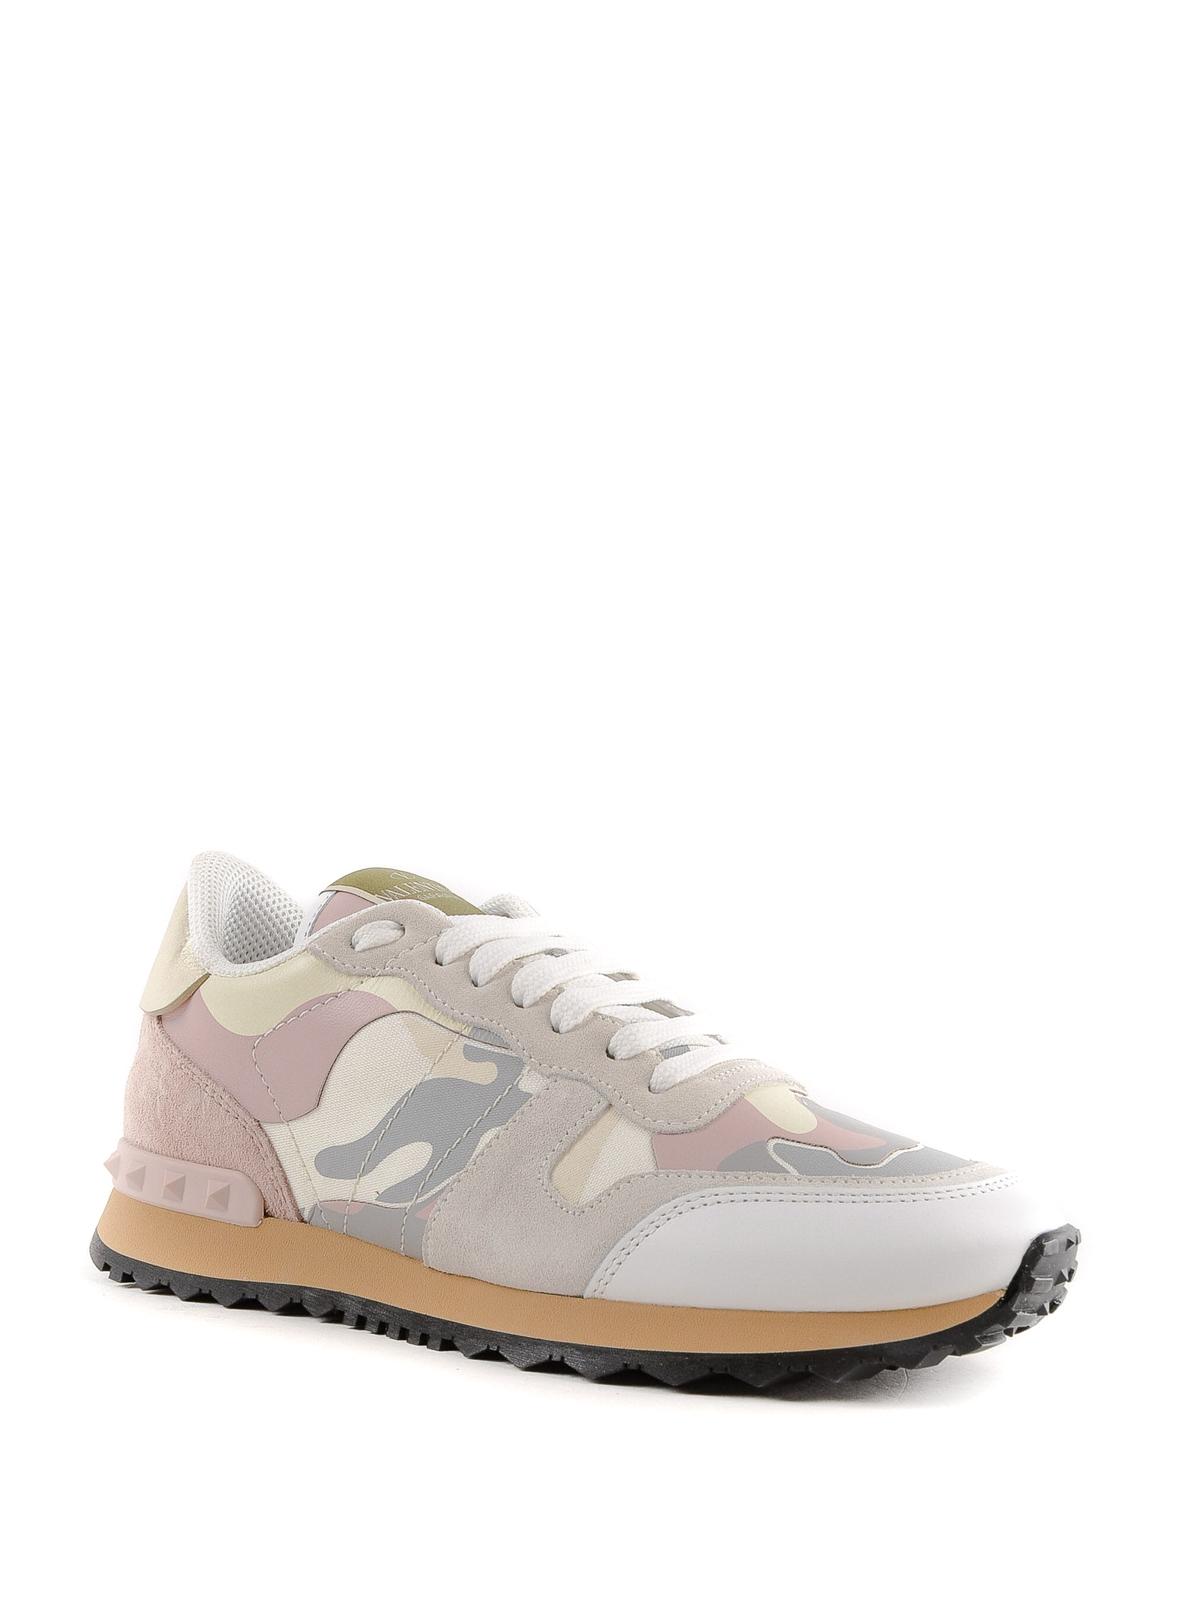 Pink Rockrunner camouflage sneakers